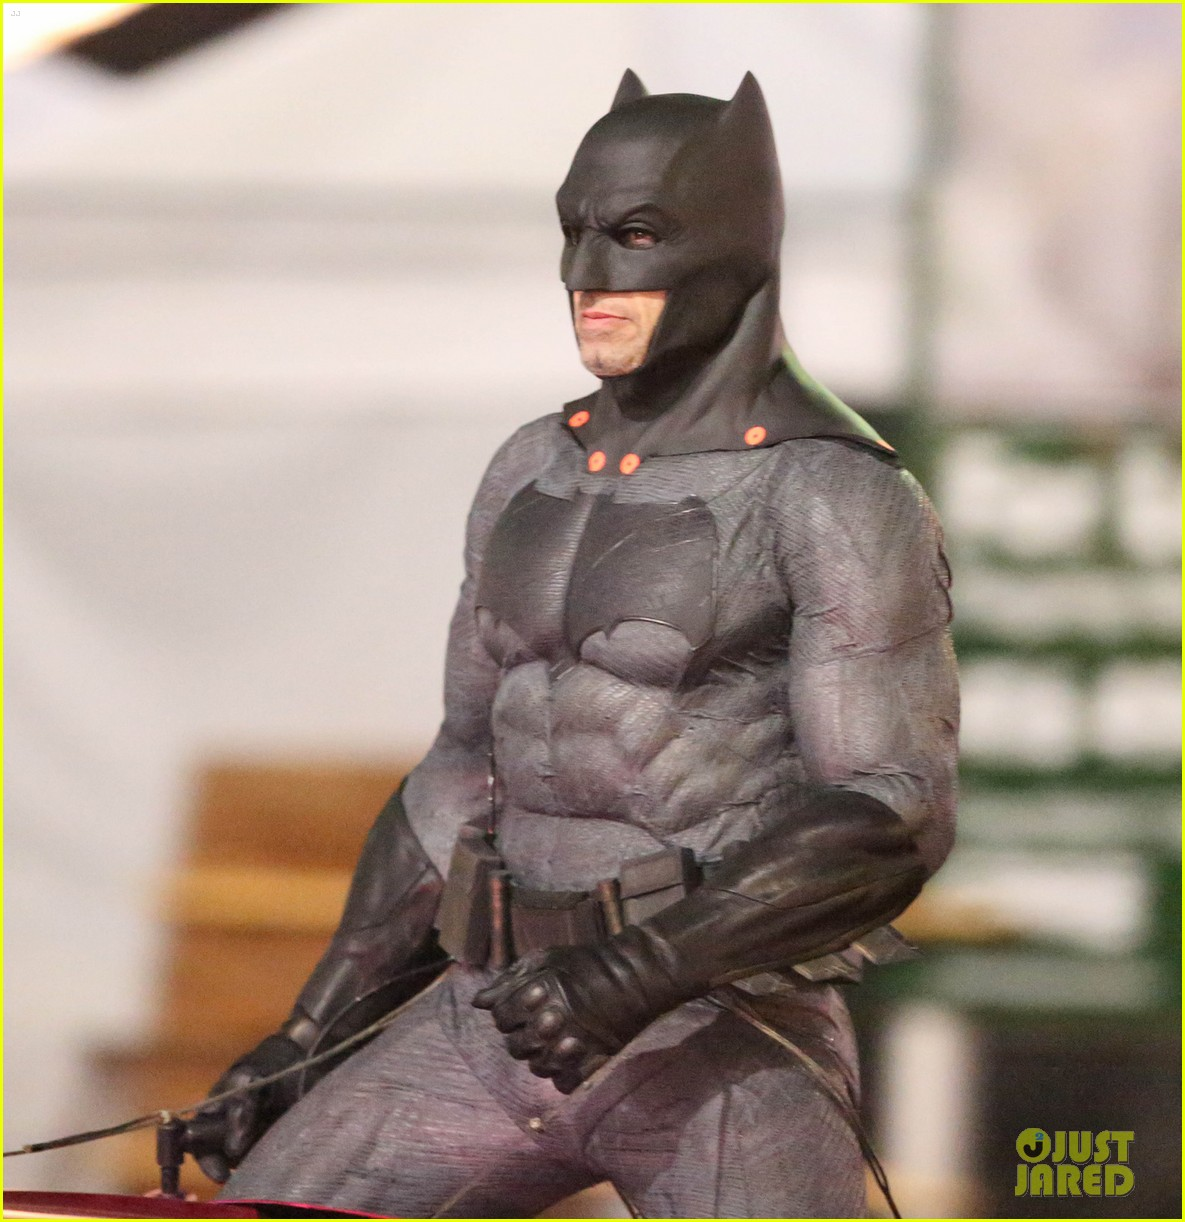 ben affleck 39 s batman chases after jared leto 39 s joker in new 39 suicide squad 39 set photos photo. Black Bedroom Furniture Sets. Home Design Ideas